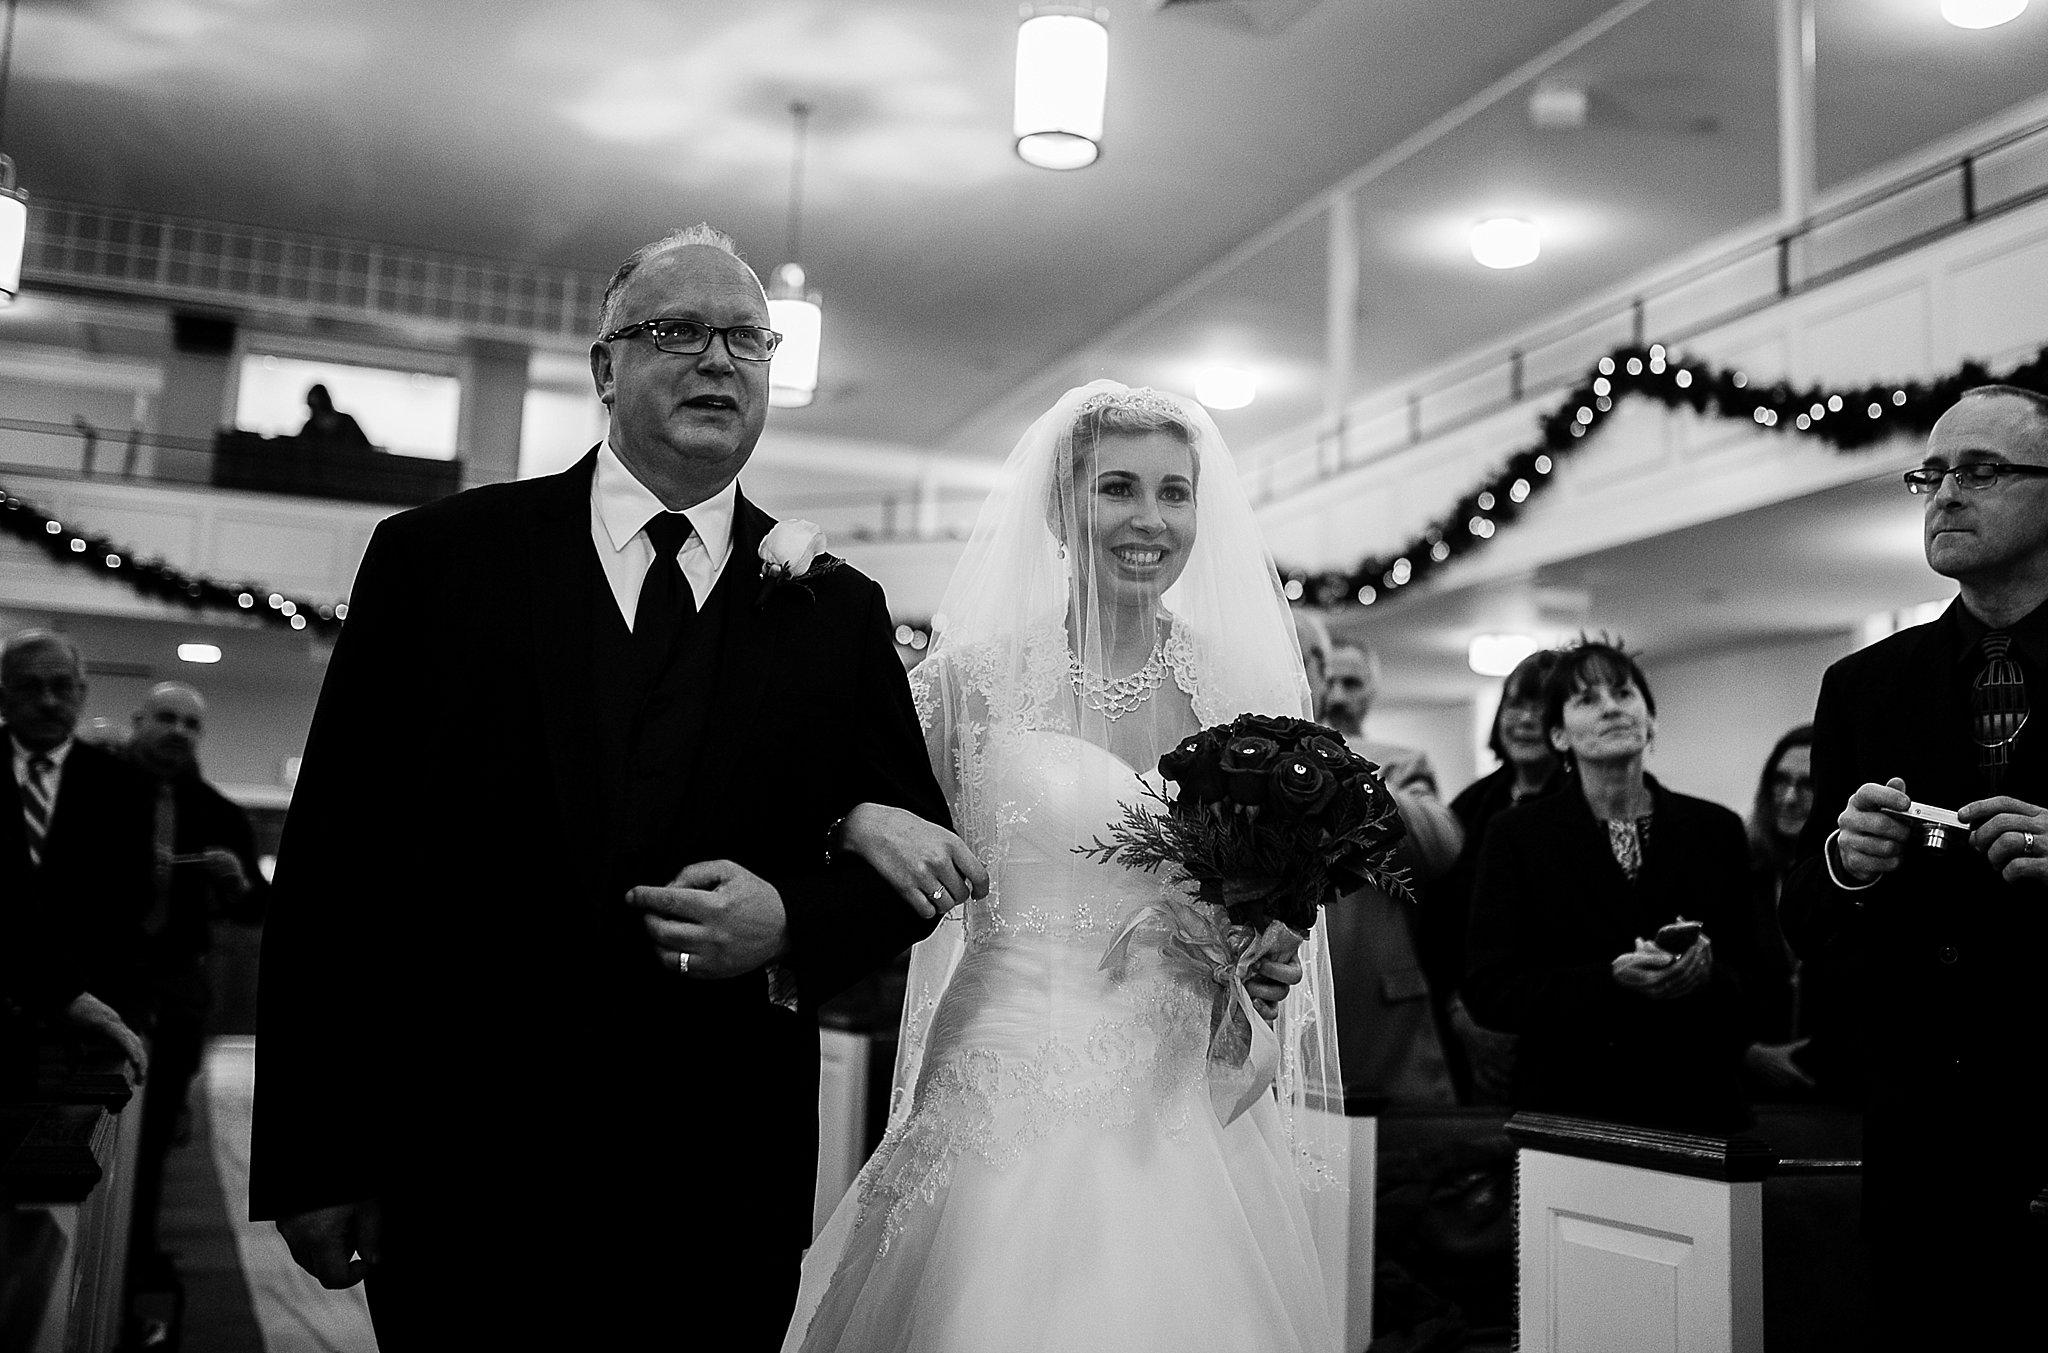 Wollaston Church of the Nazarene Wedding Boston Wedding Photographer13.jpg